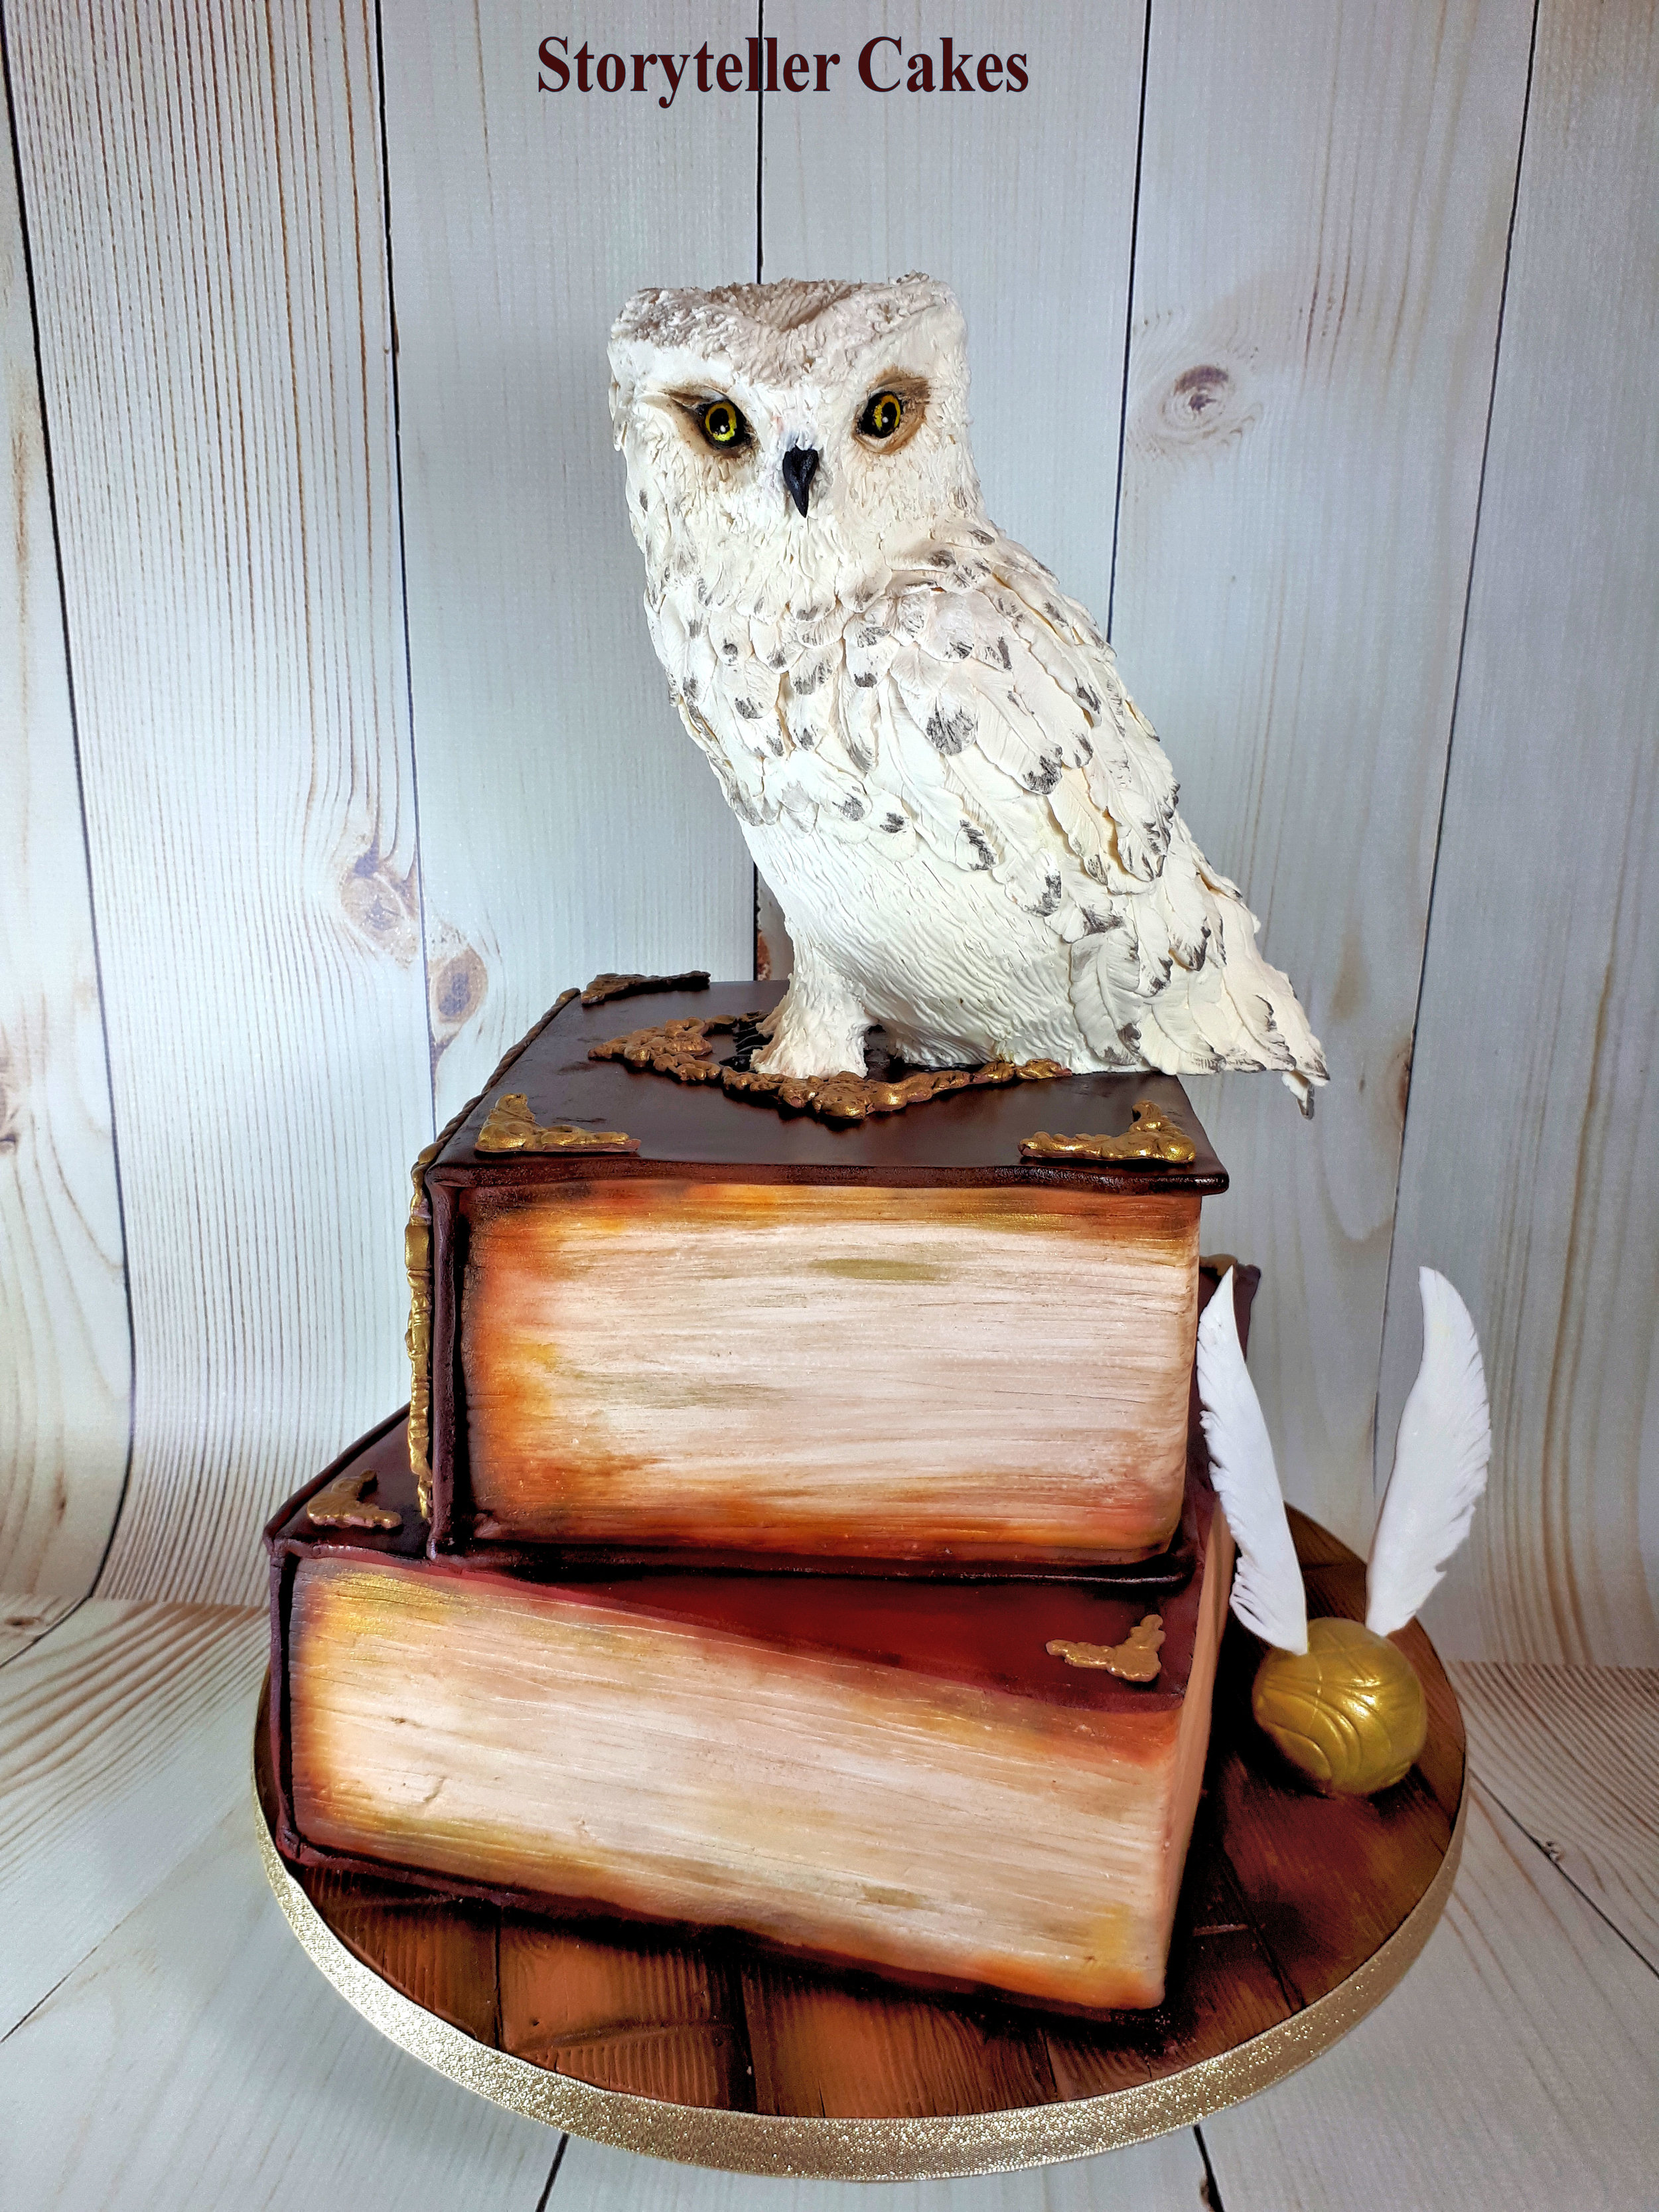 harry potter owl book birthday cake 1.jpg